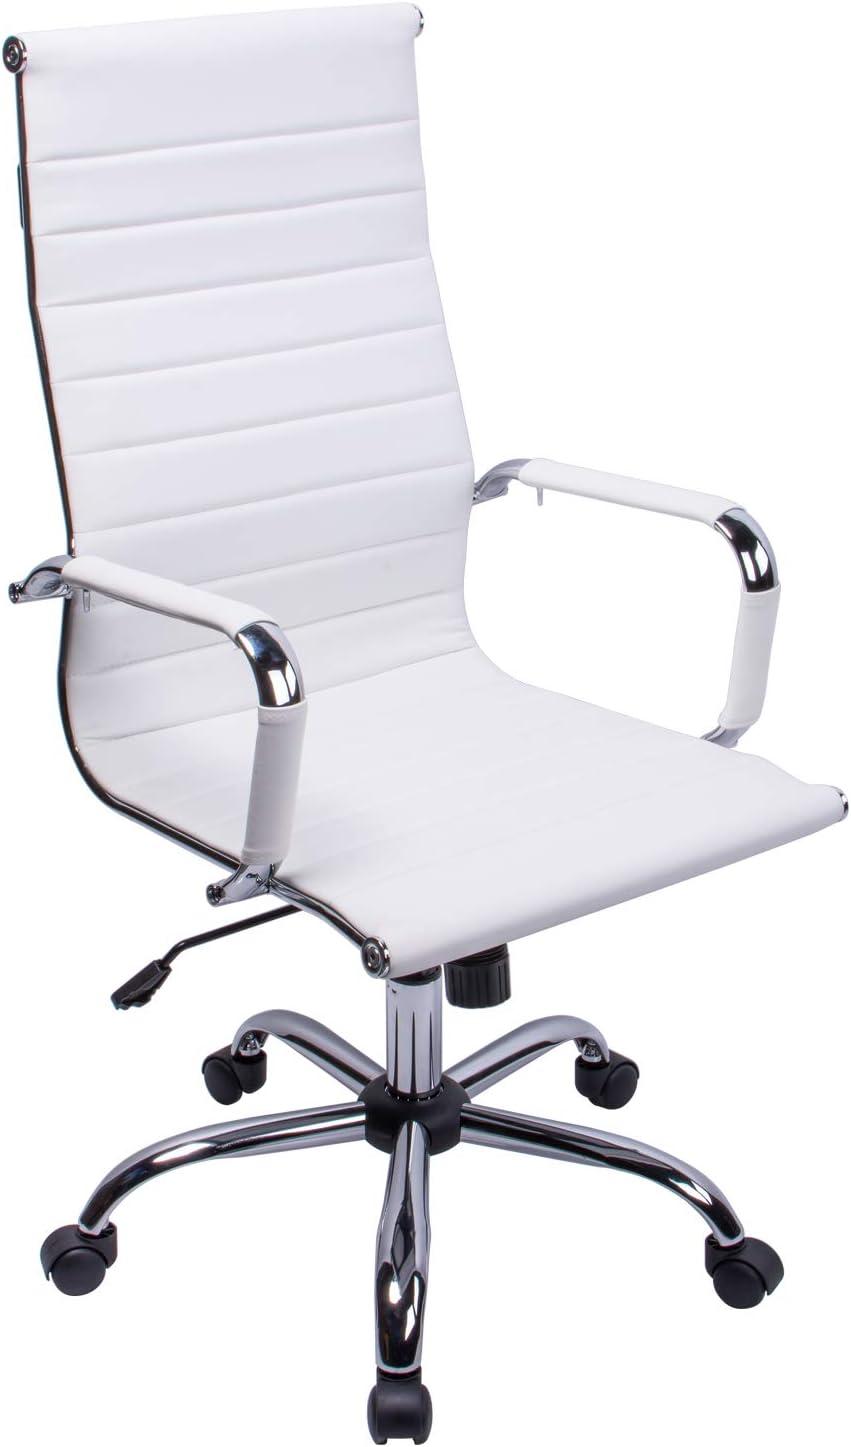 Bürostuhl weiß ergonomisch